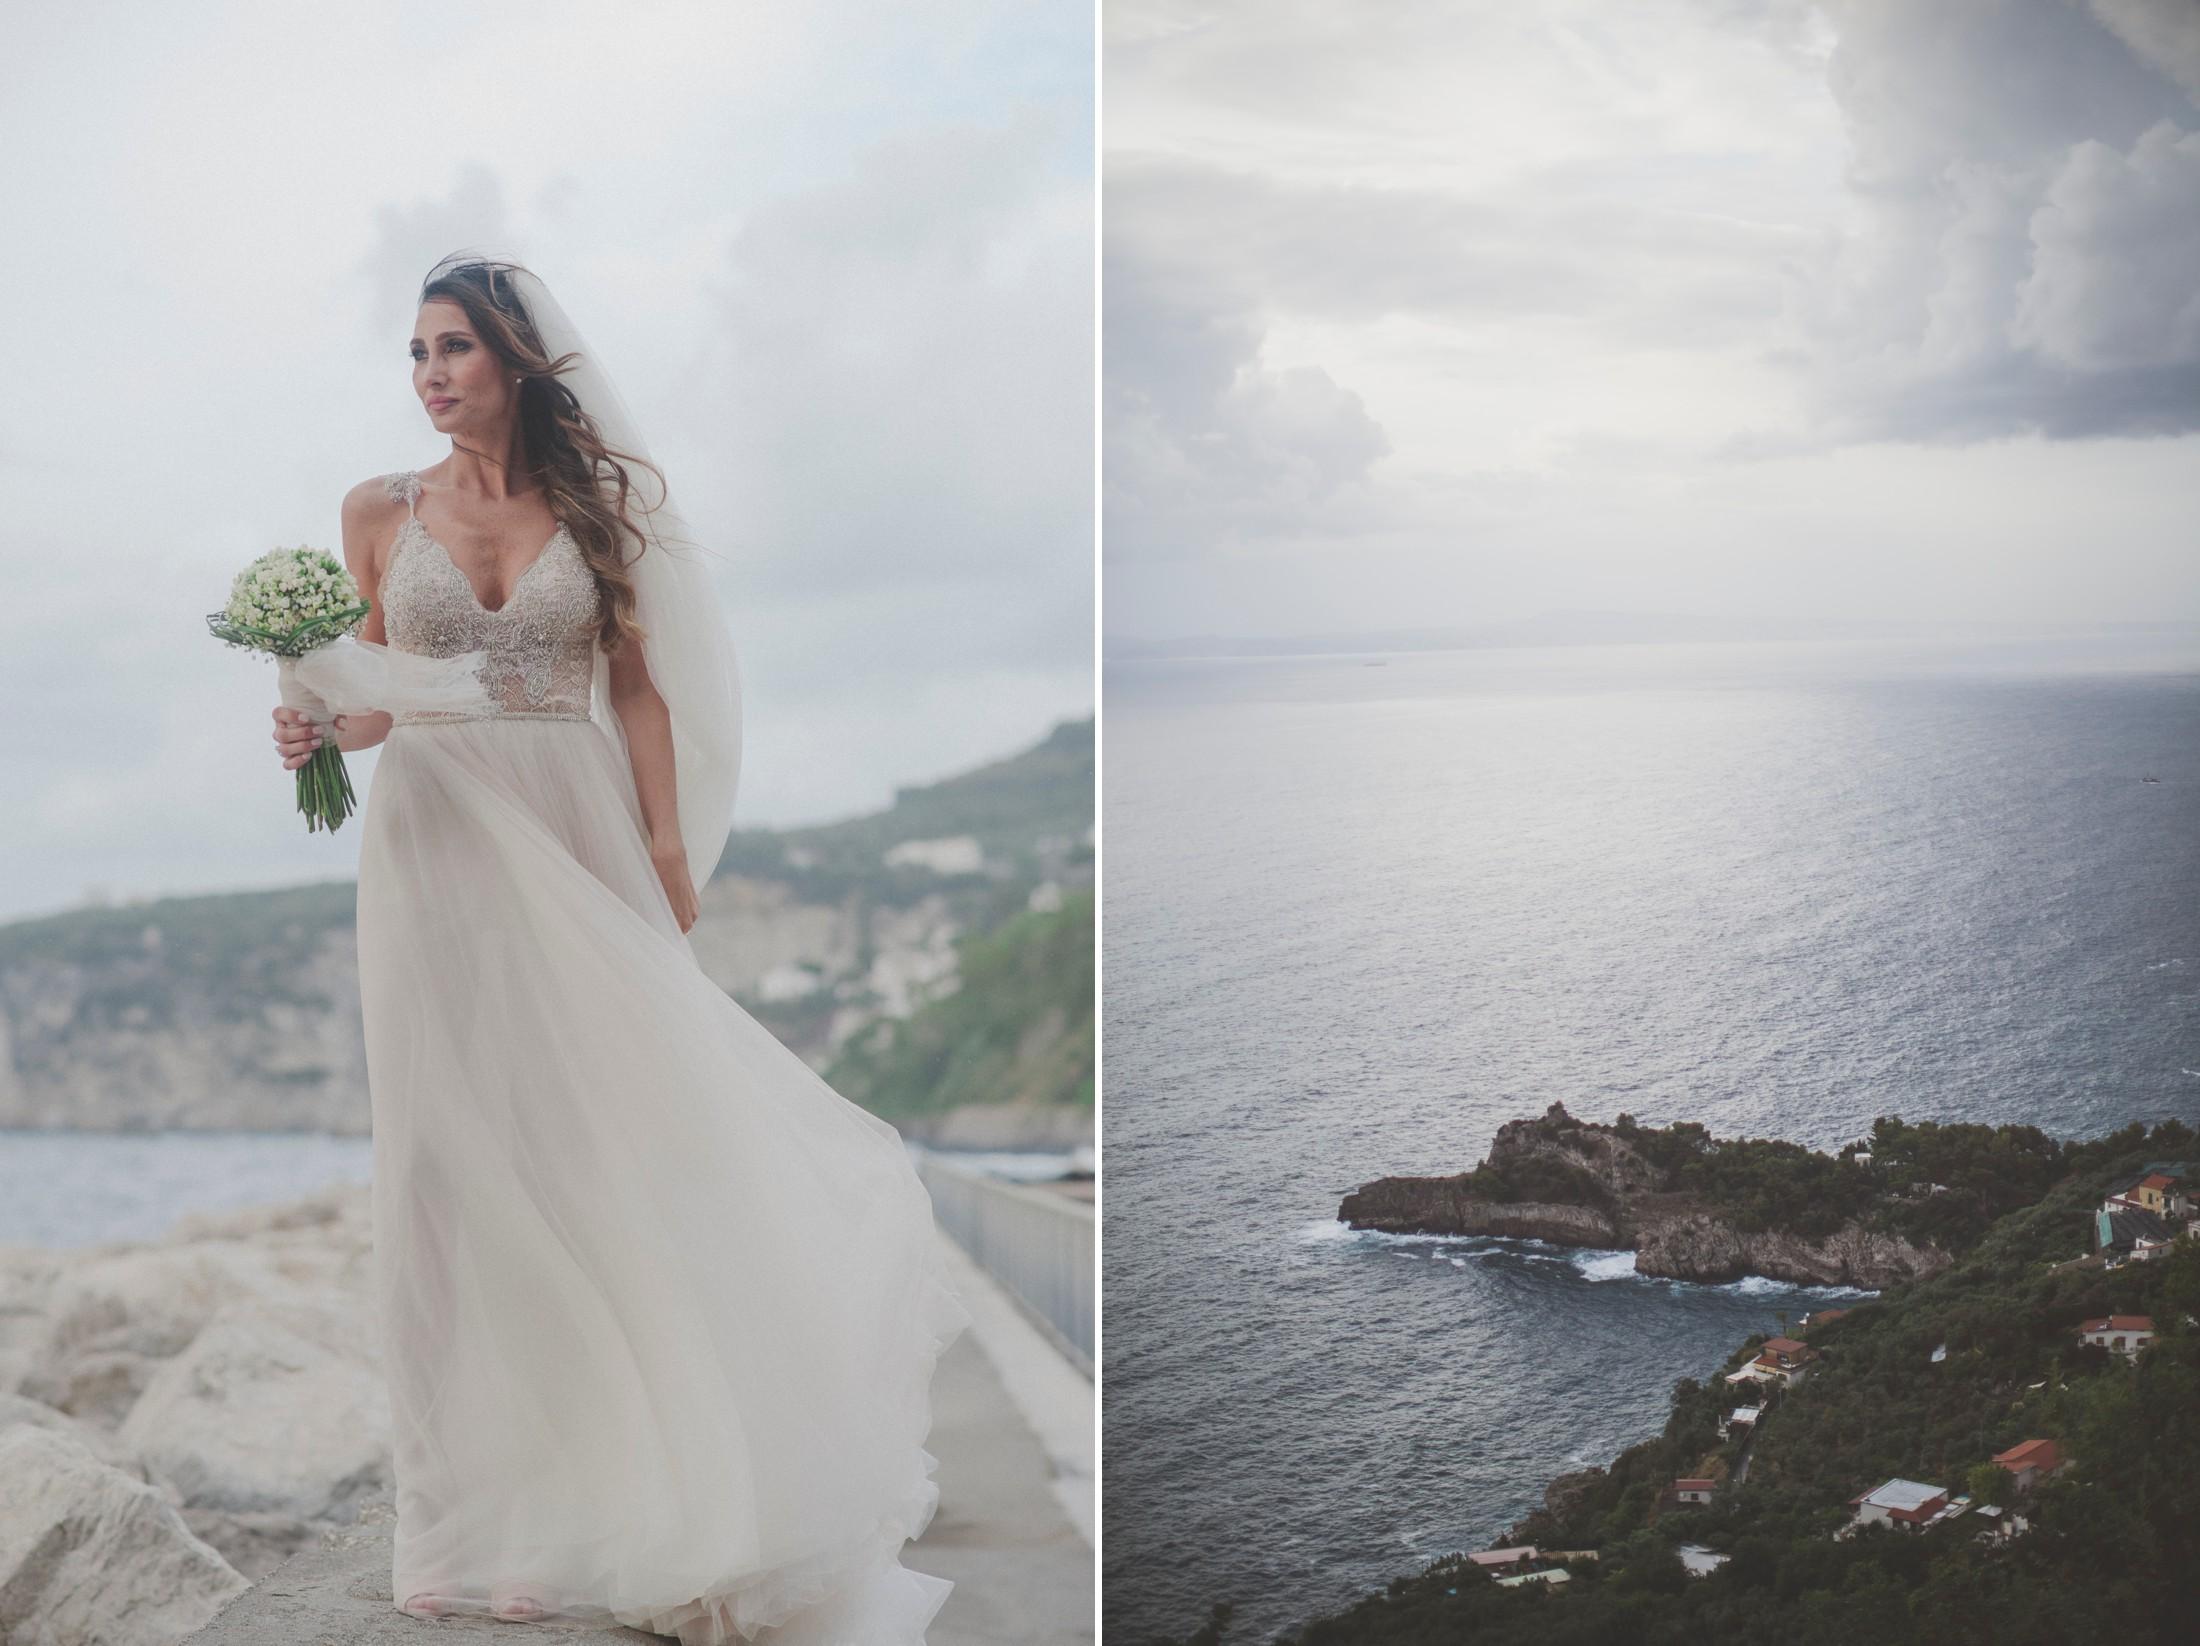 sorrento wedding collage landscape and bride's portrait